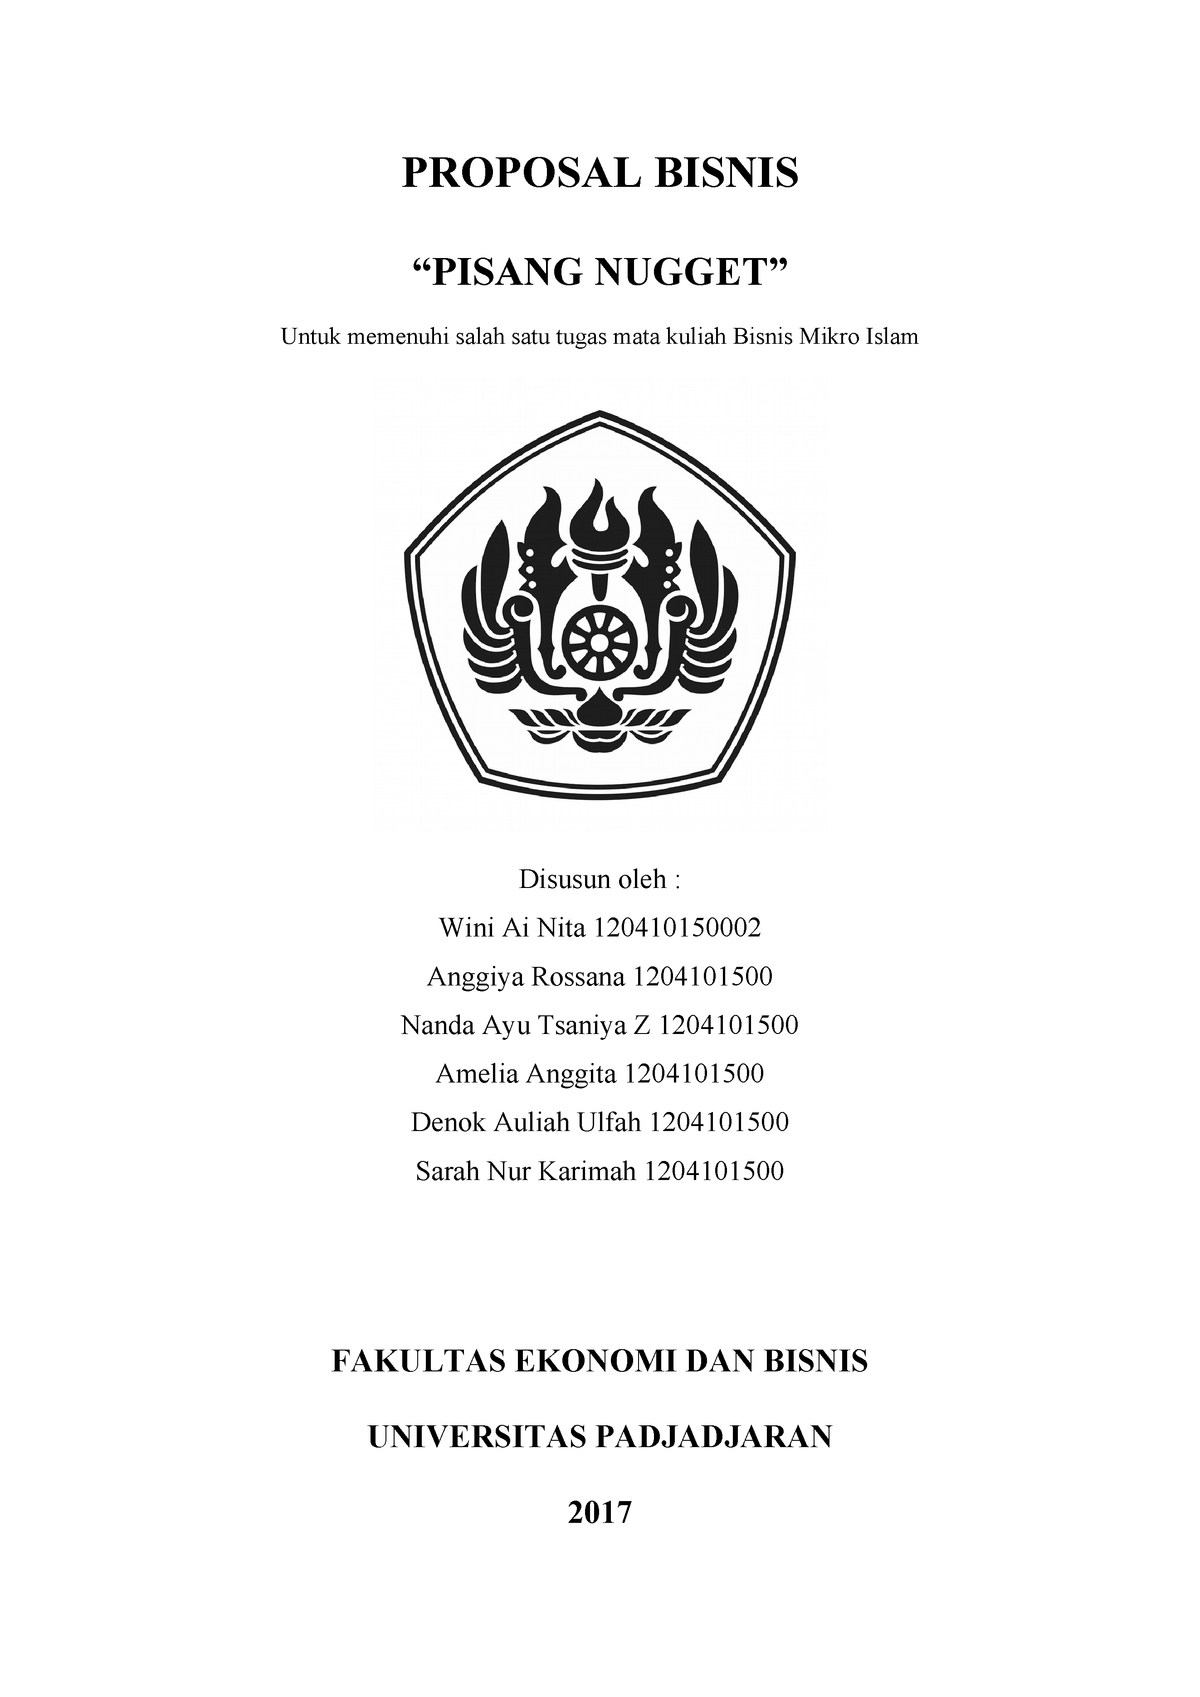 Pisang Nugget - proposal - Microeconomics - UNPAD - StuDocu